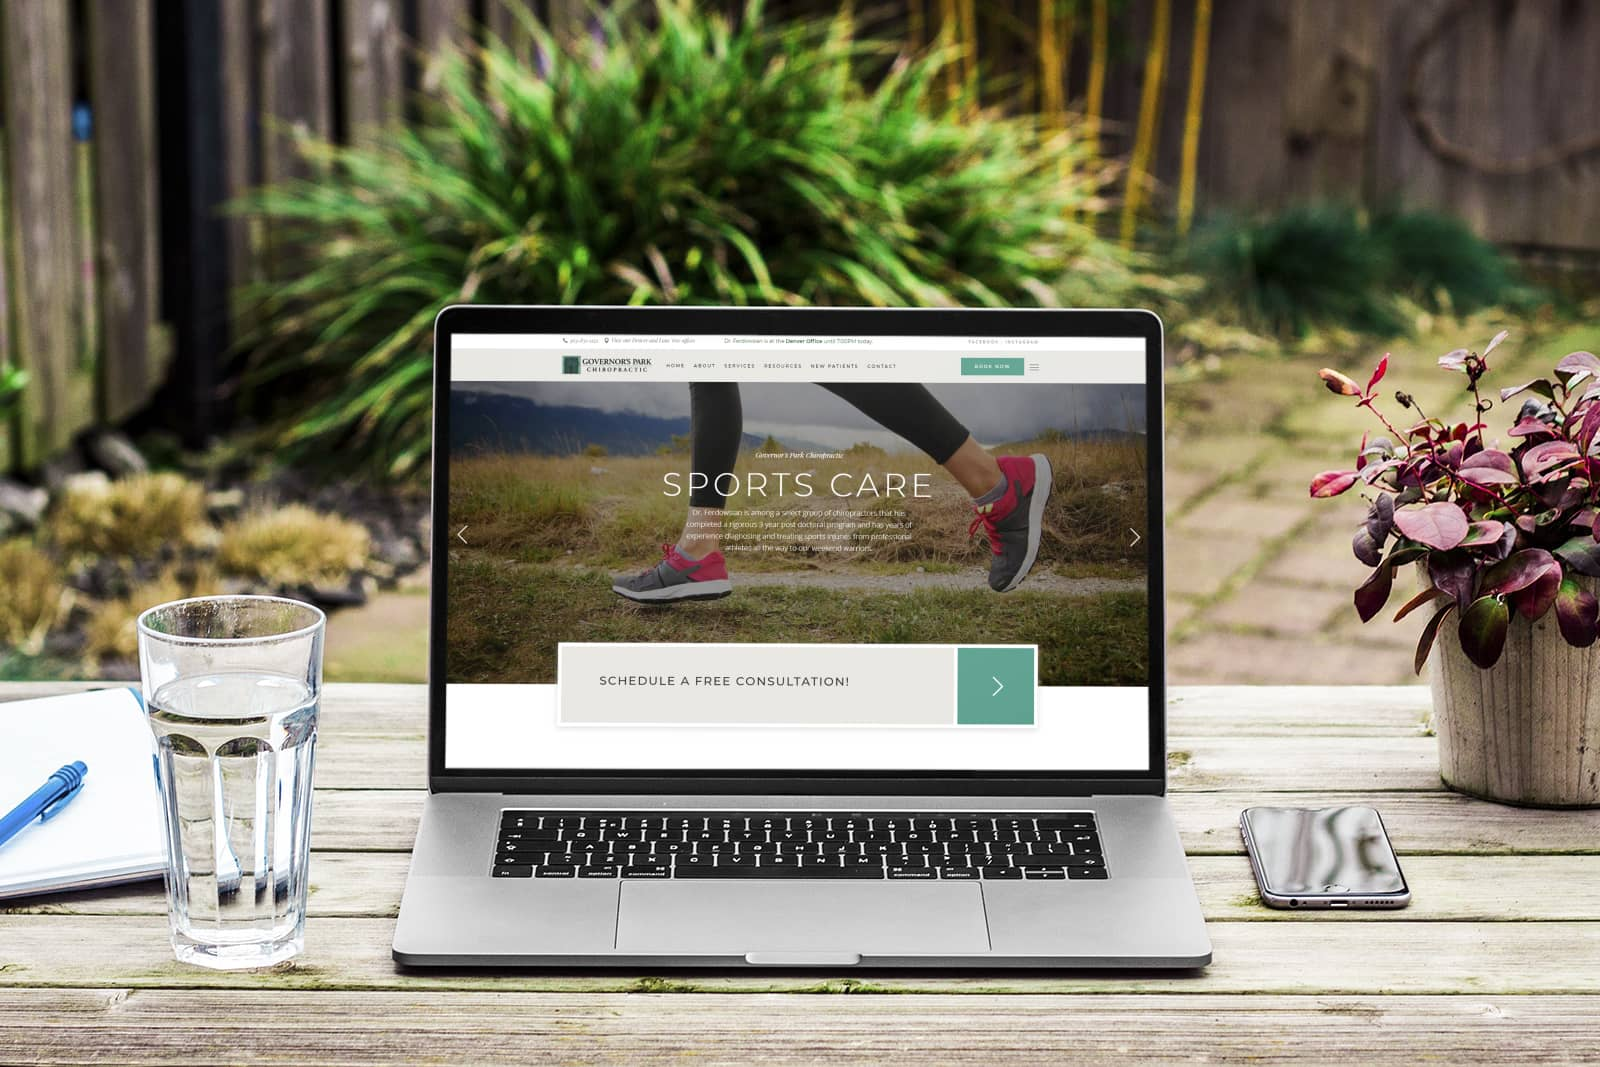 govs park chiropractic web design